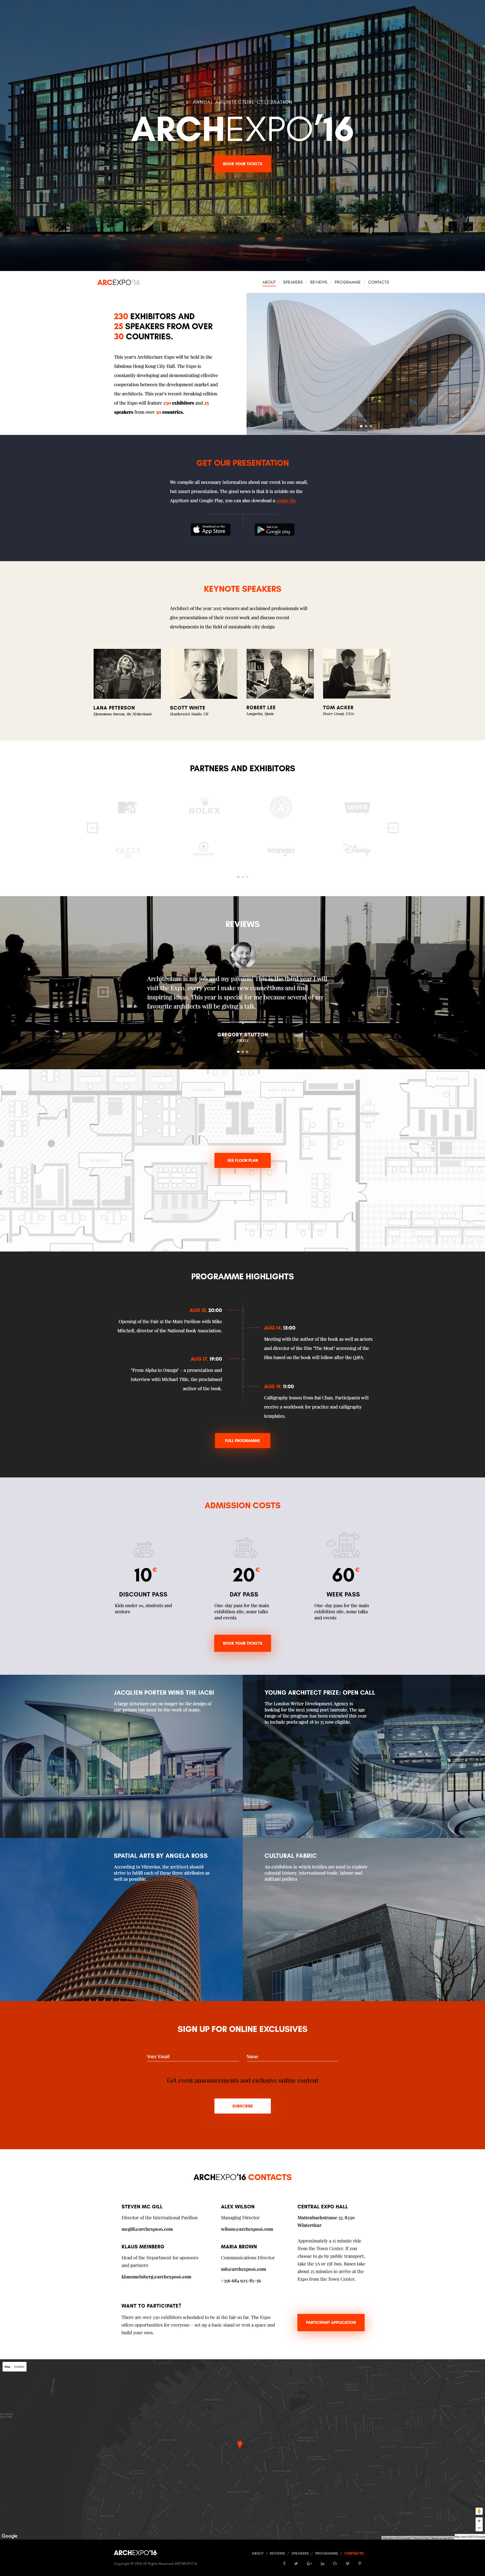 Arch Expo Website Template - screenshot